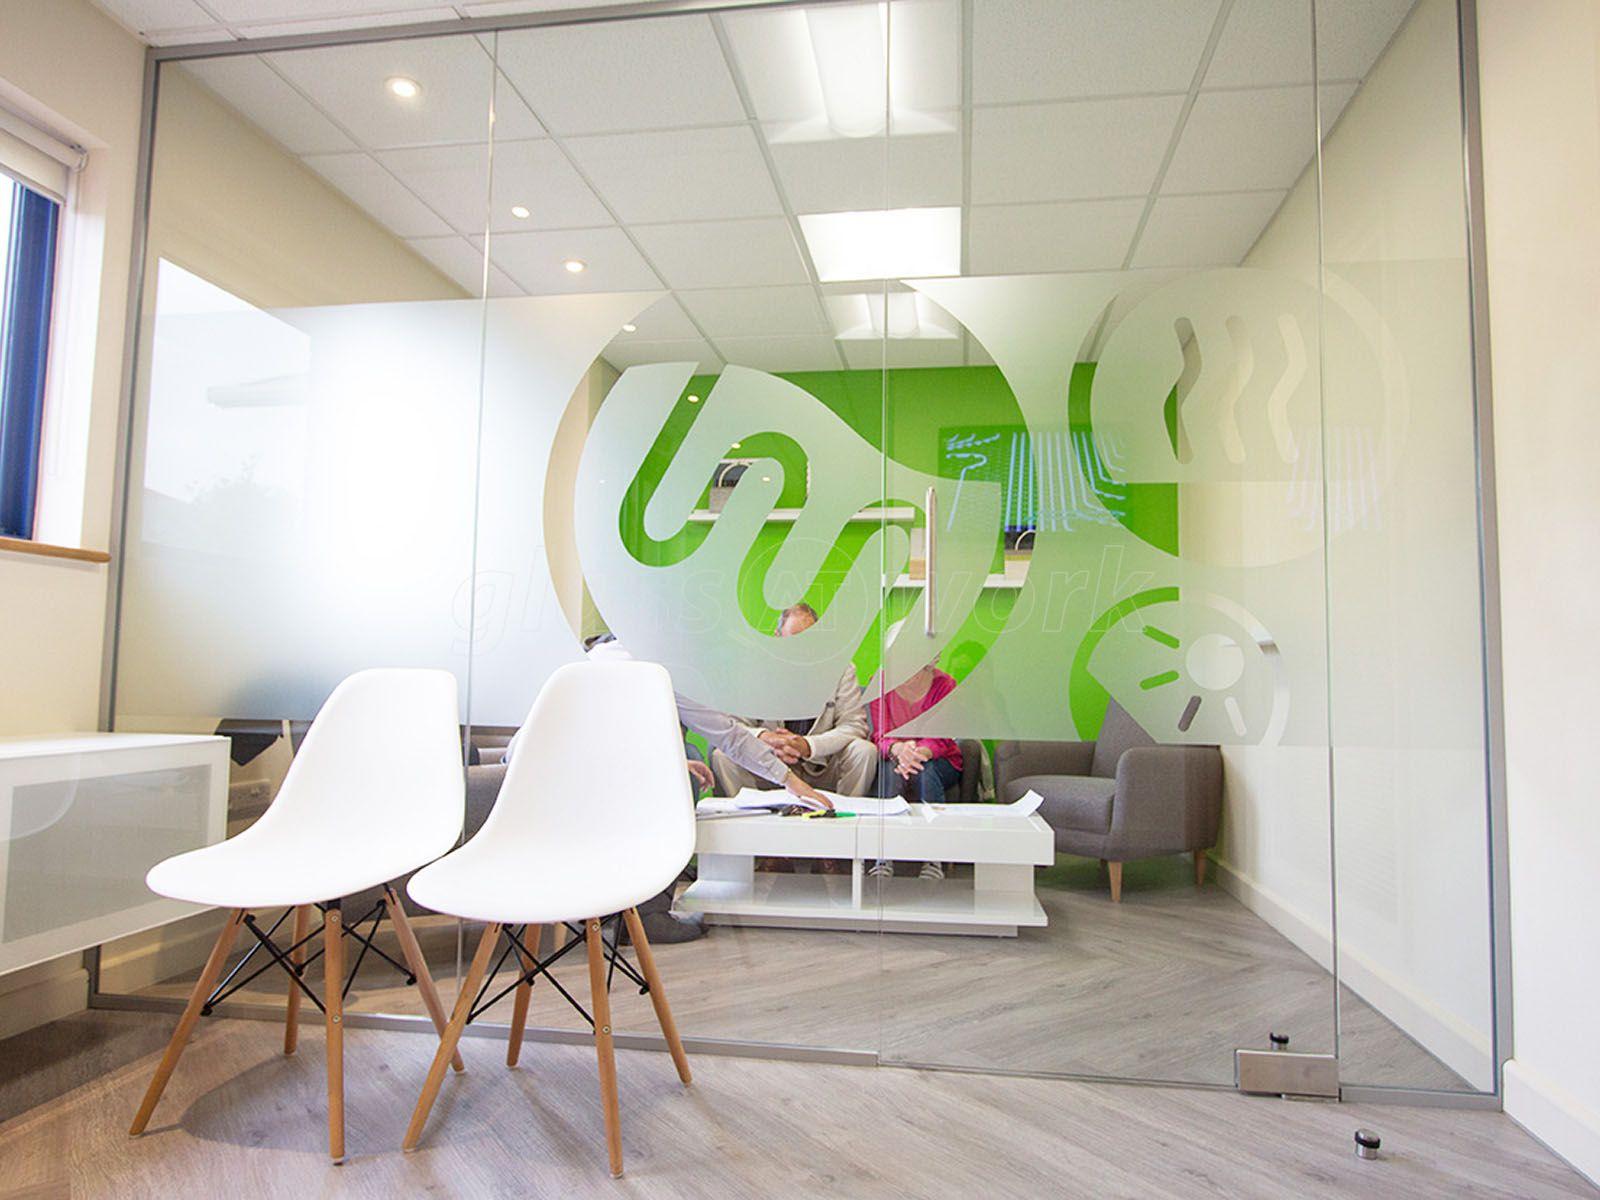 Single Glazed Frameless Glass Office Partitioning in 2019